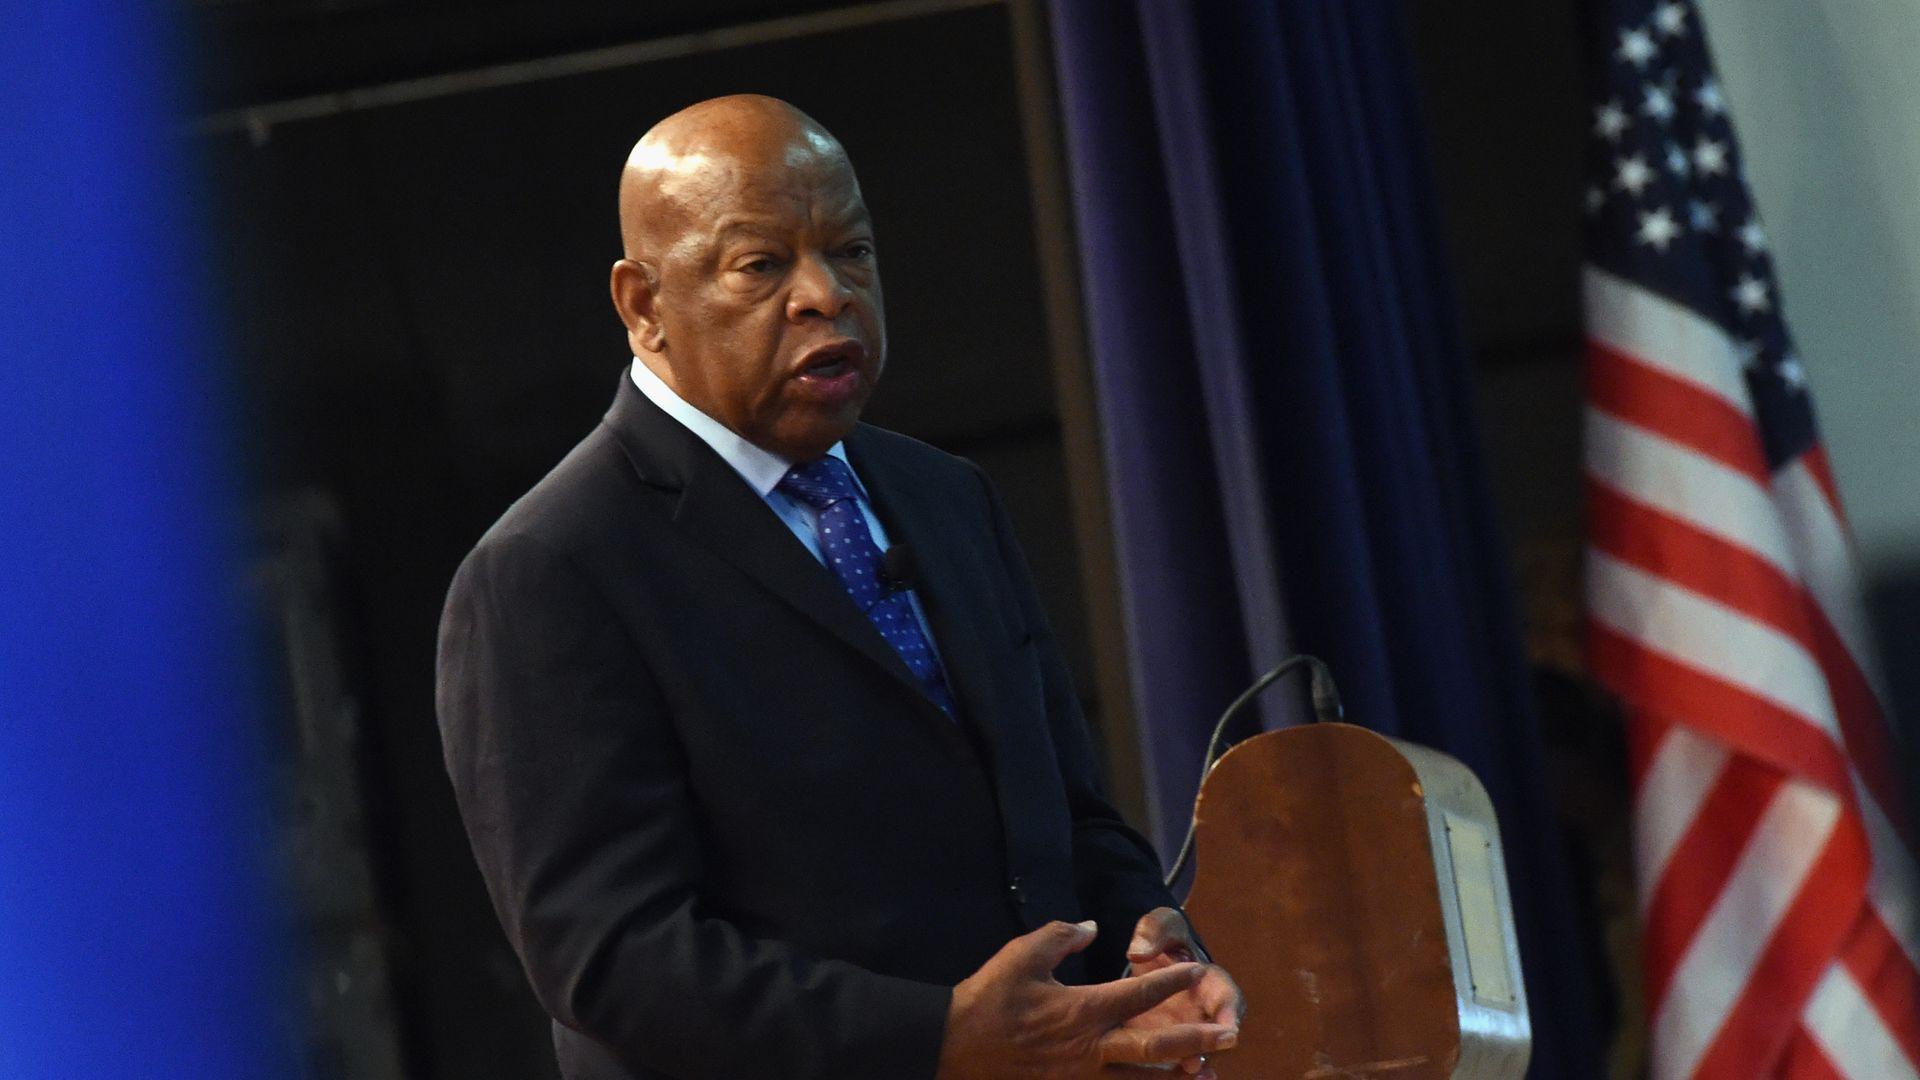 Civil rights icon Rep. John Lewis endorses impeachment proceedings